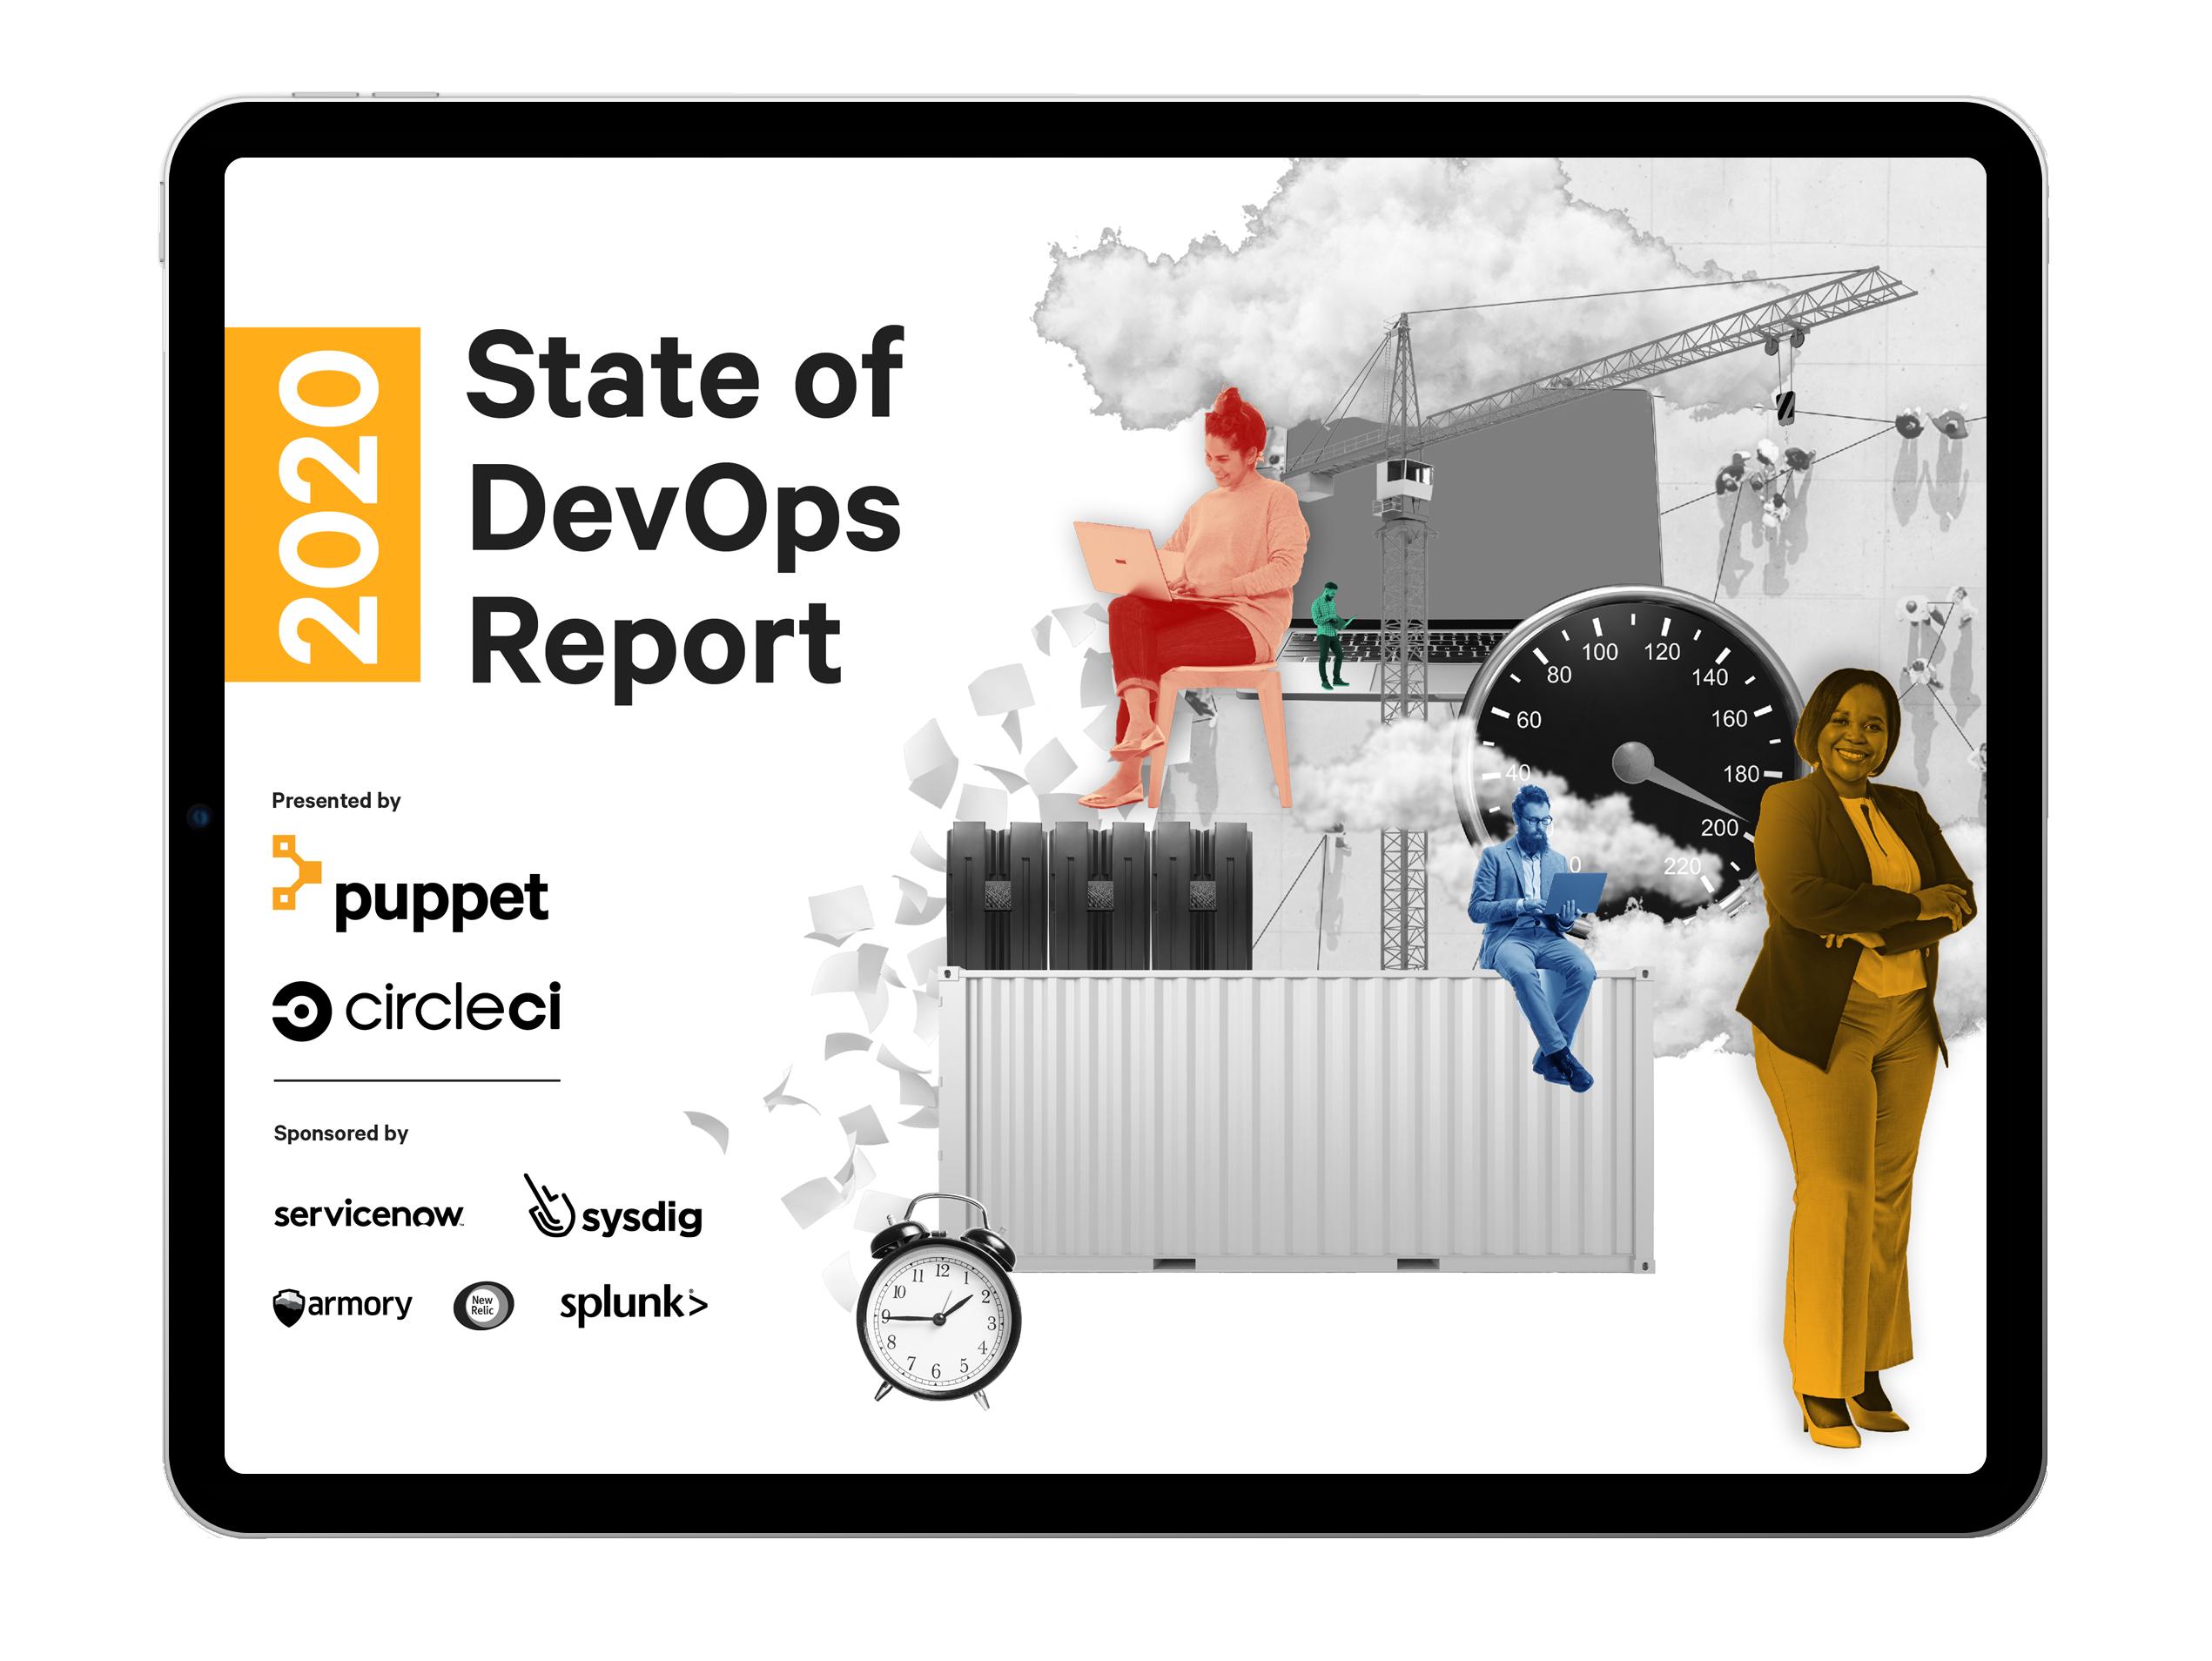 State of DevOps Report 2020